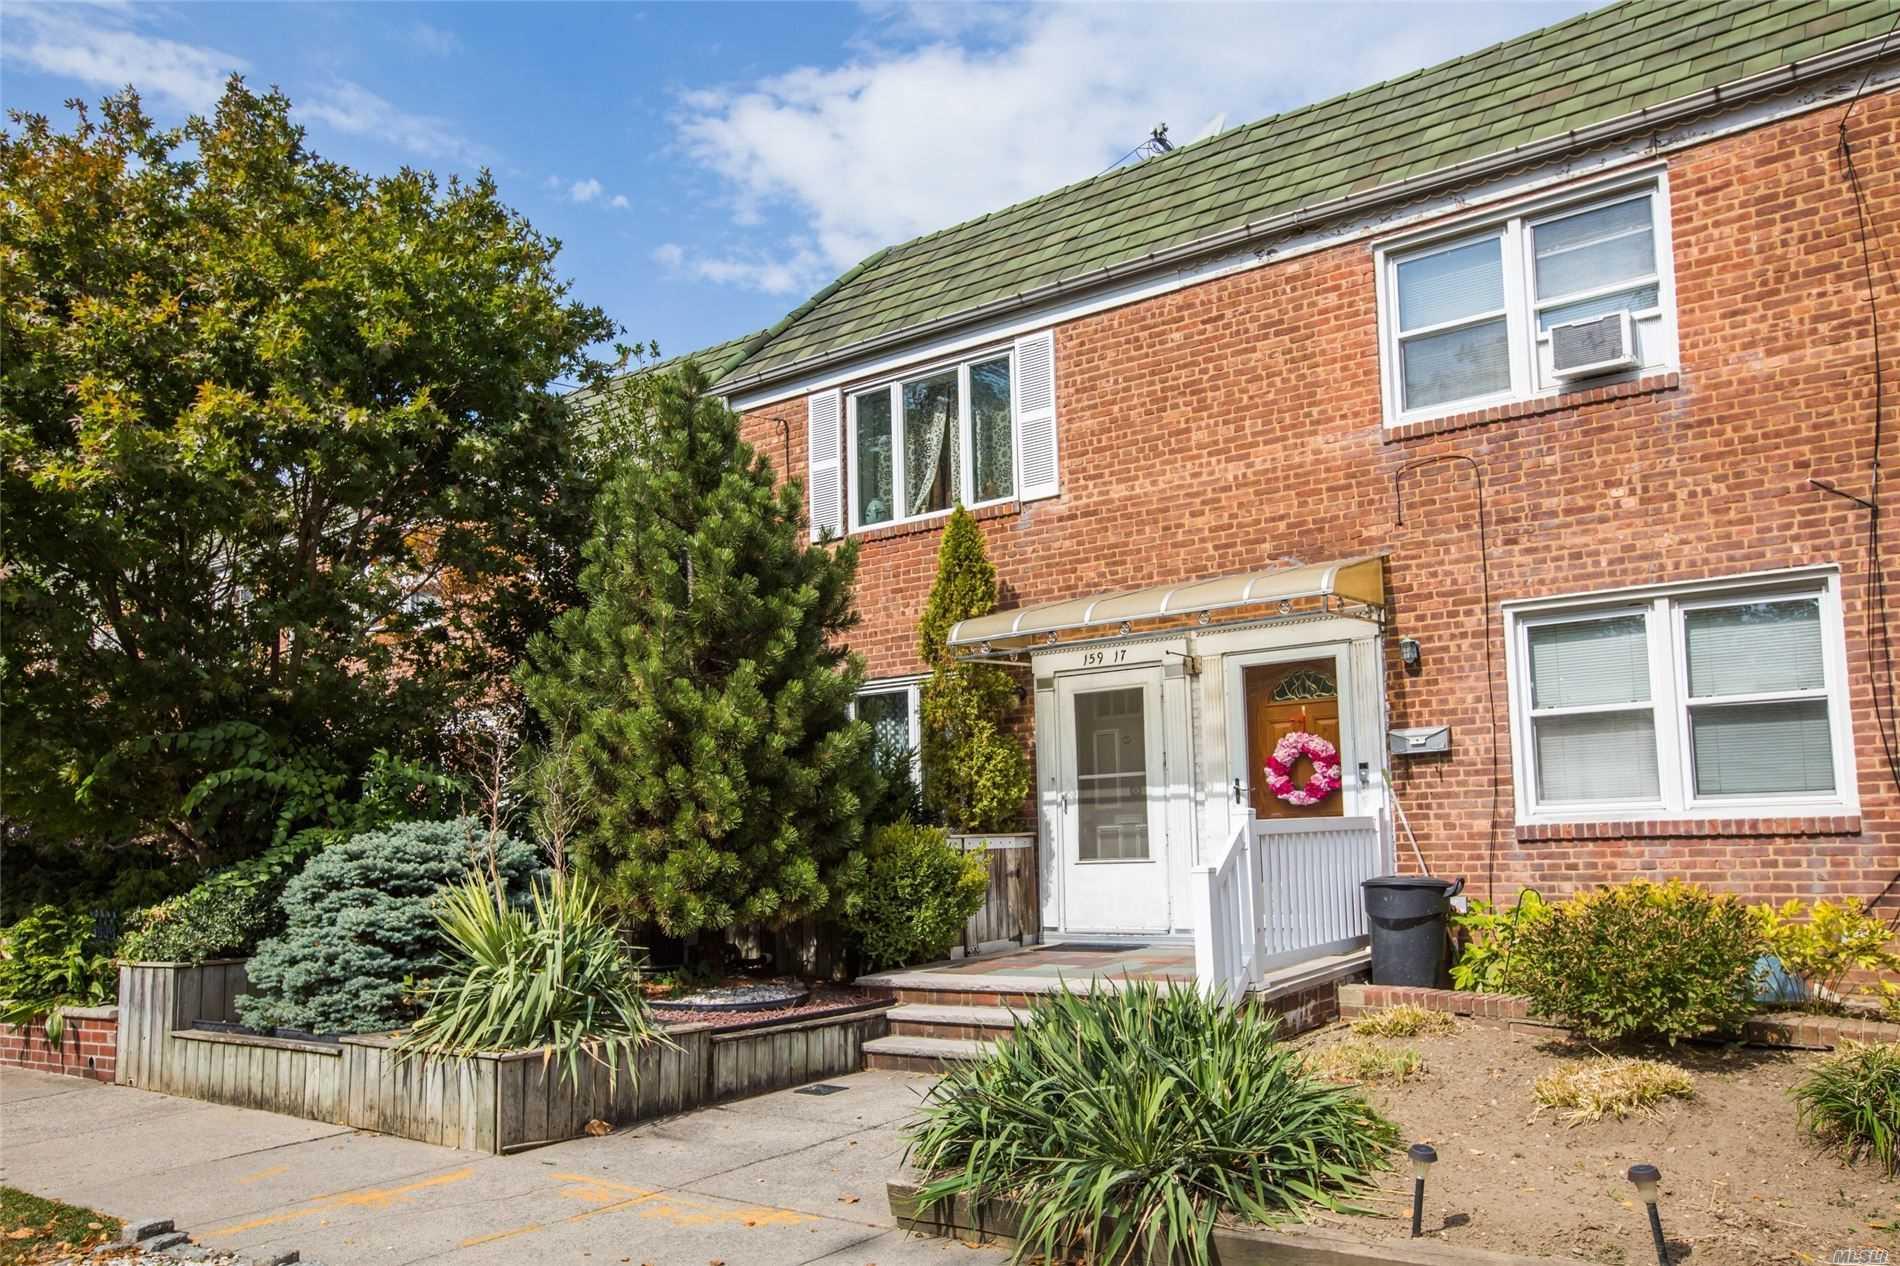 Property for sale at 159-17 Powells Cove Boulevard, Whitestone NY 11357, Whitestone,  New York 11357